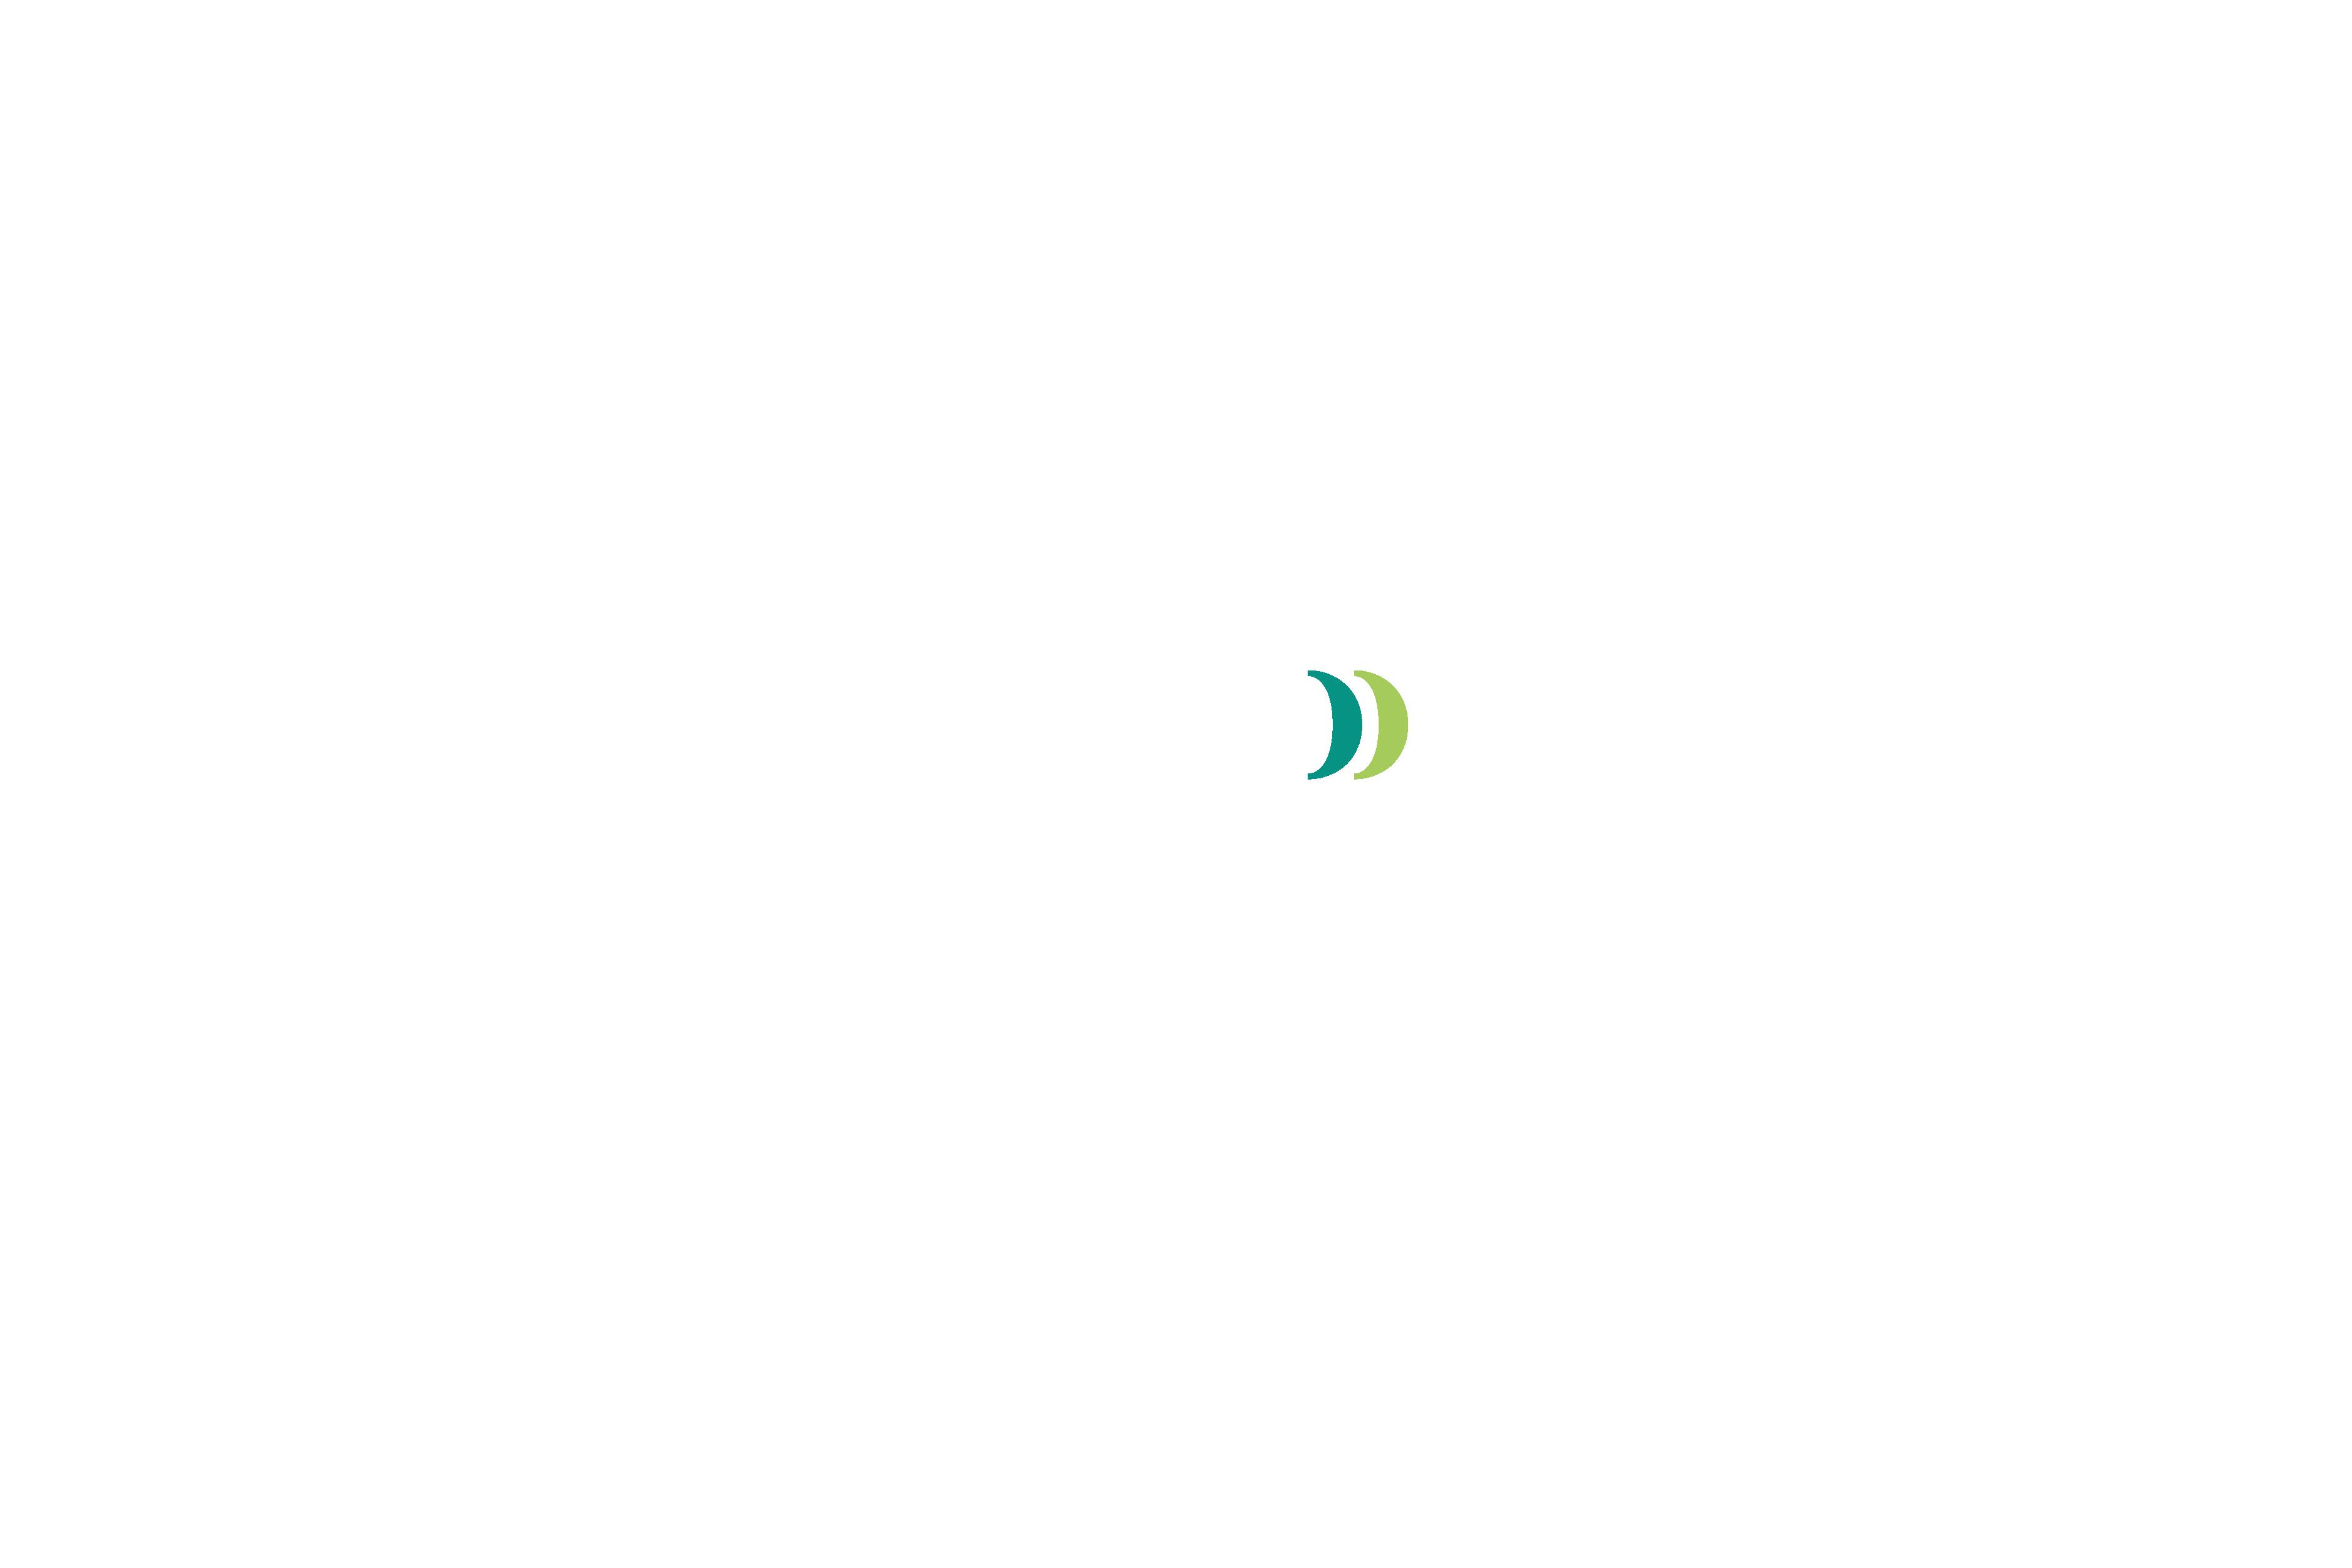 Bitflow-studio-miro-logo-research-institute